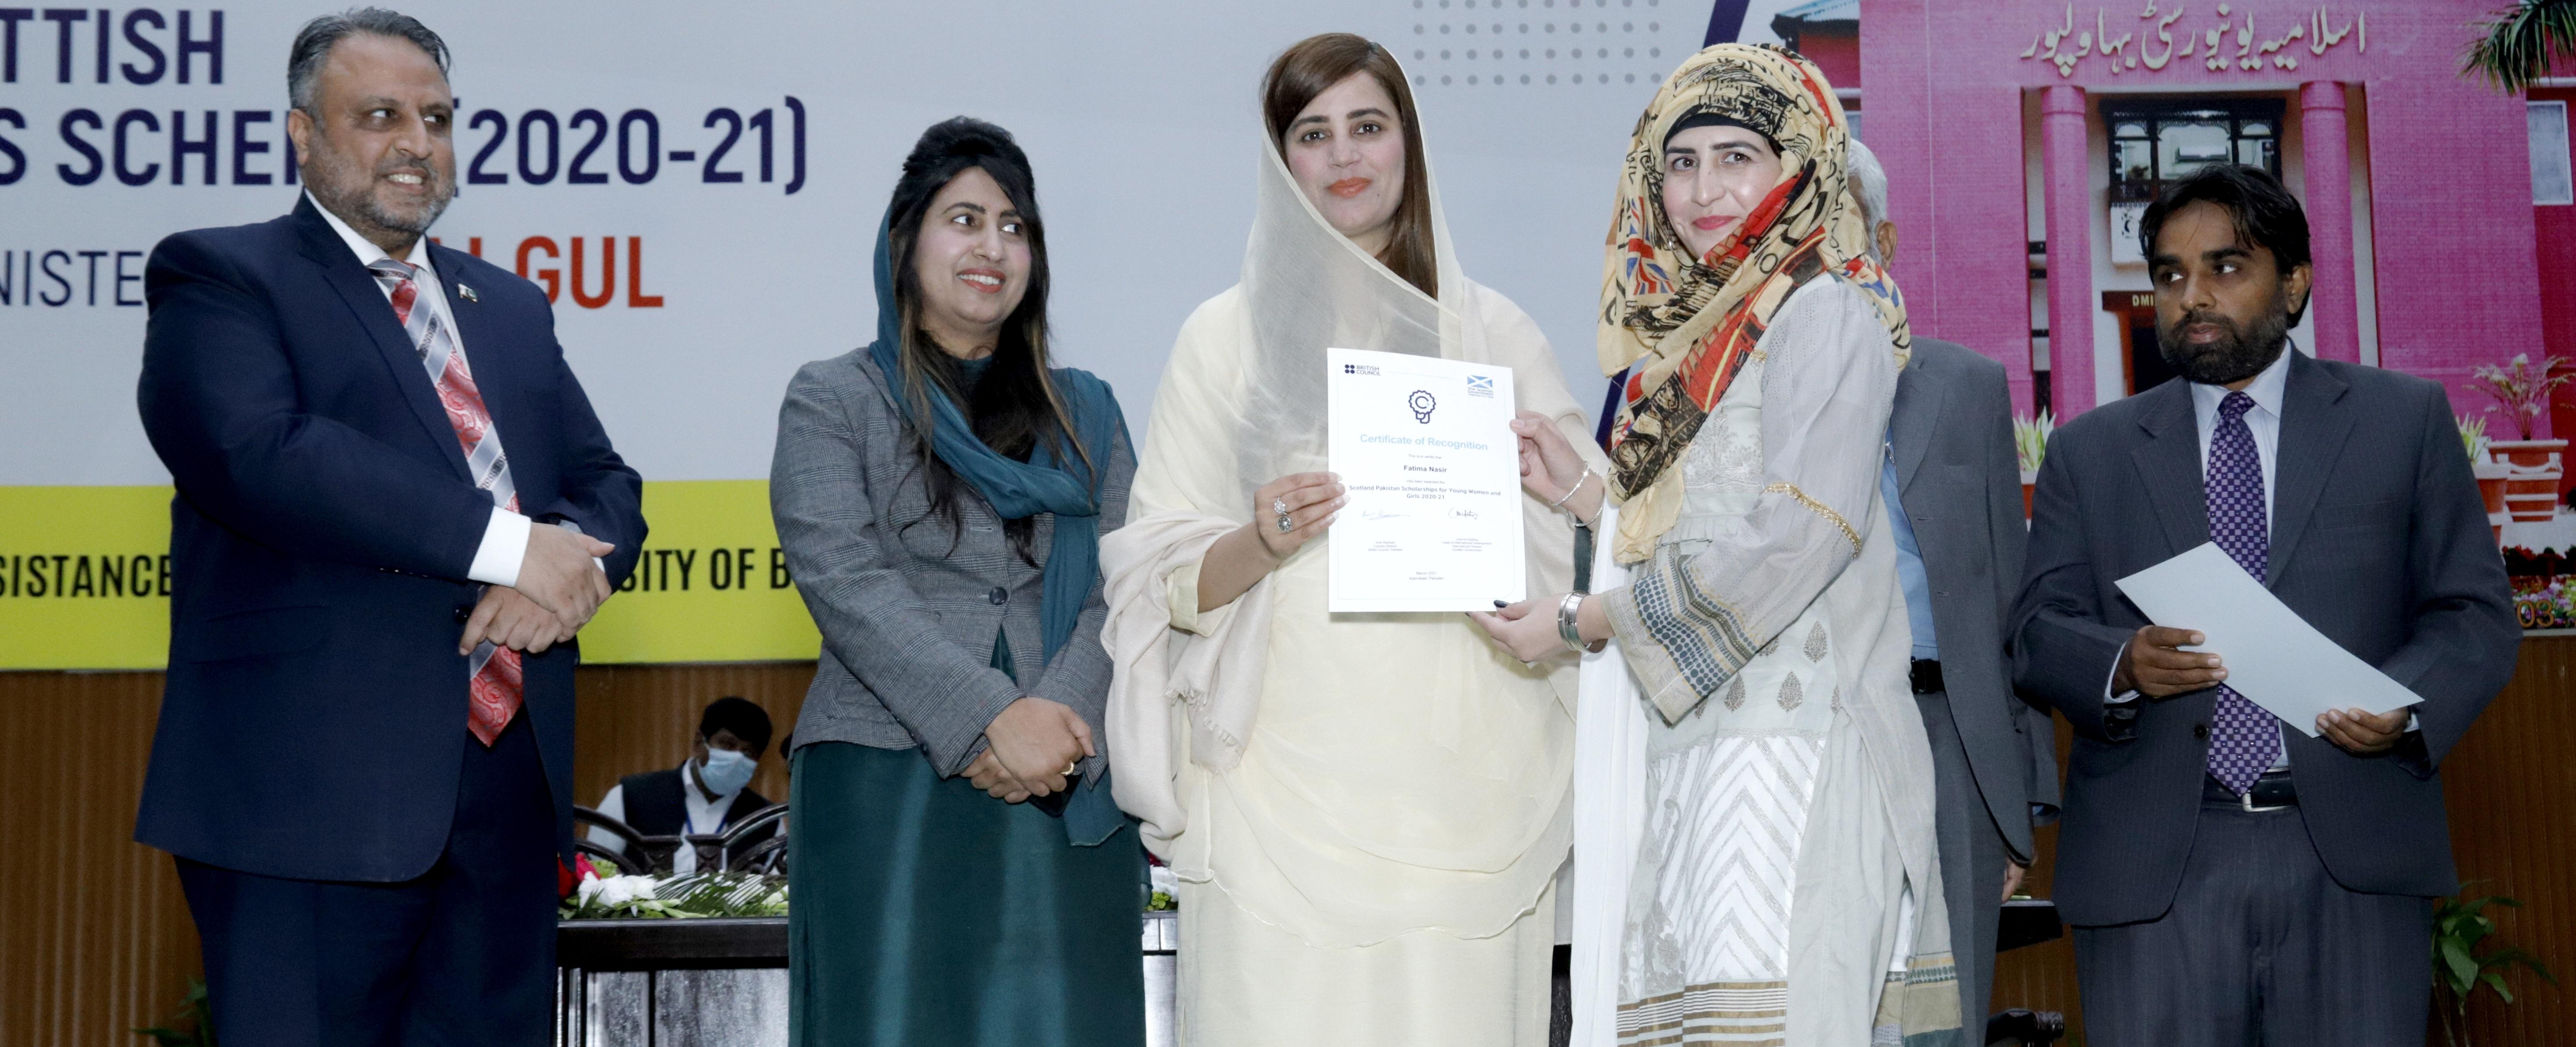 Federal Minister of State, Ms. Zartaj Gul Awards Pakistan Scottish Scholarships to 71 Female IUB Graduates